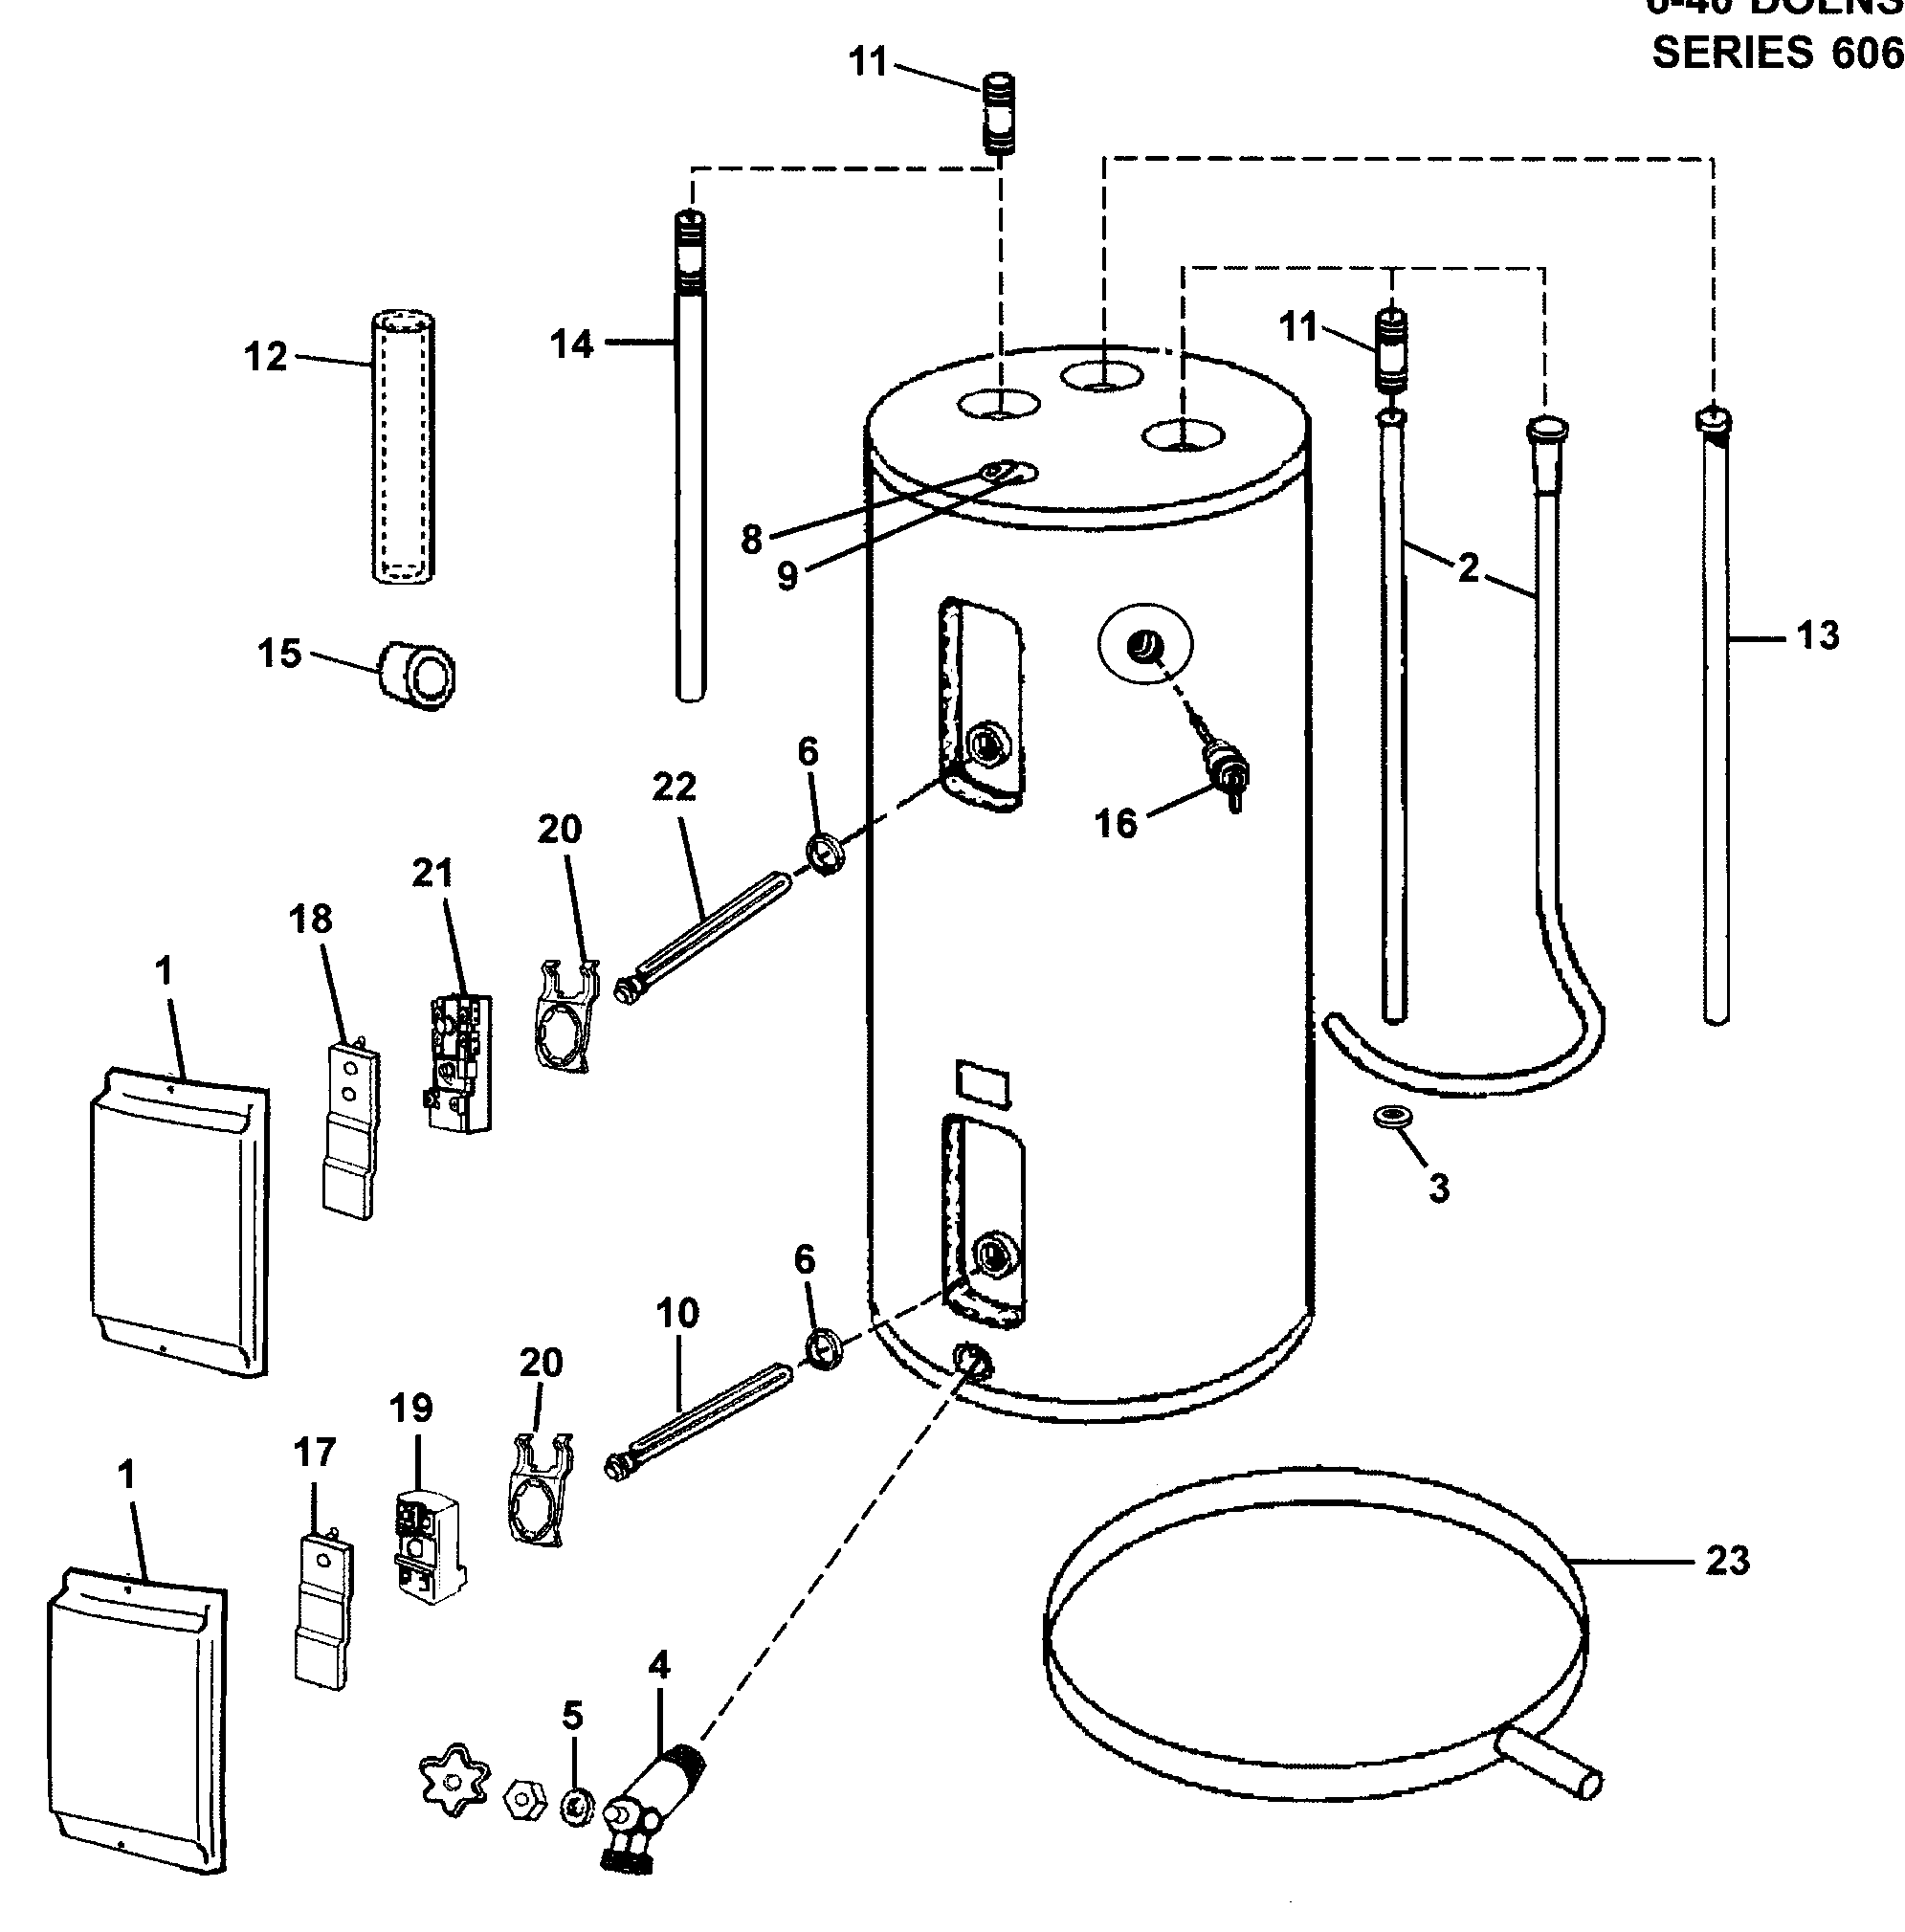 small resolution of rheem heat wiring diagram free picture schematic